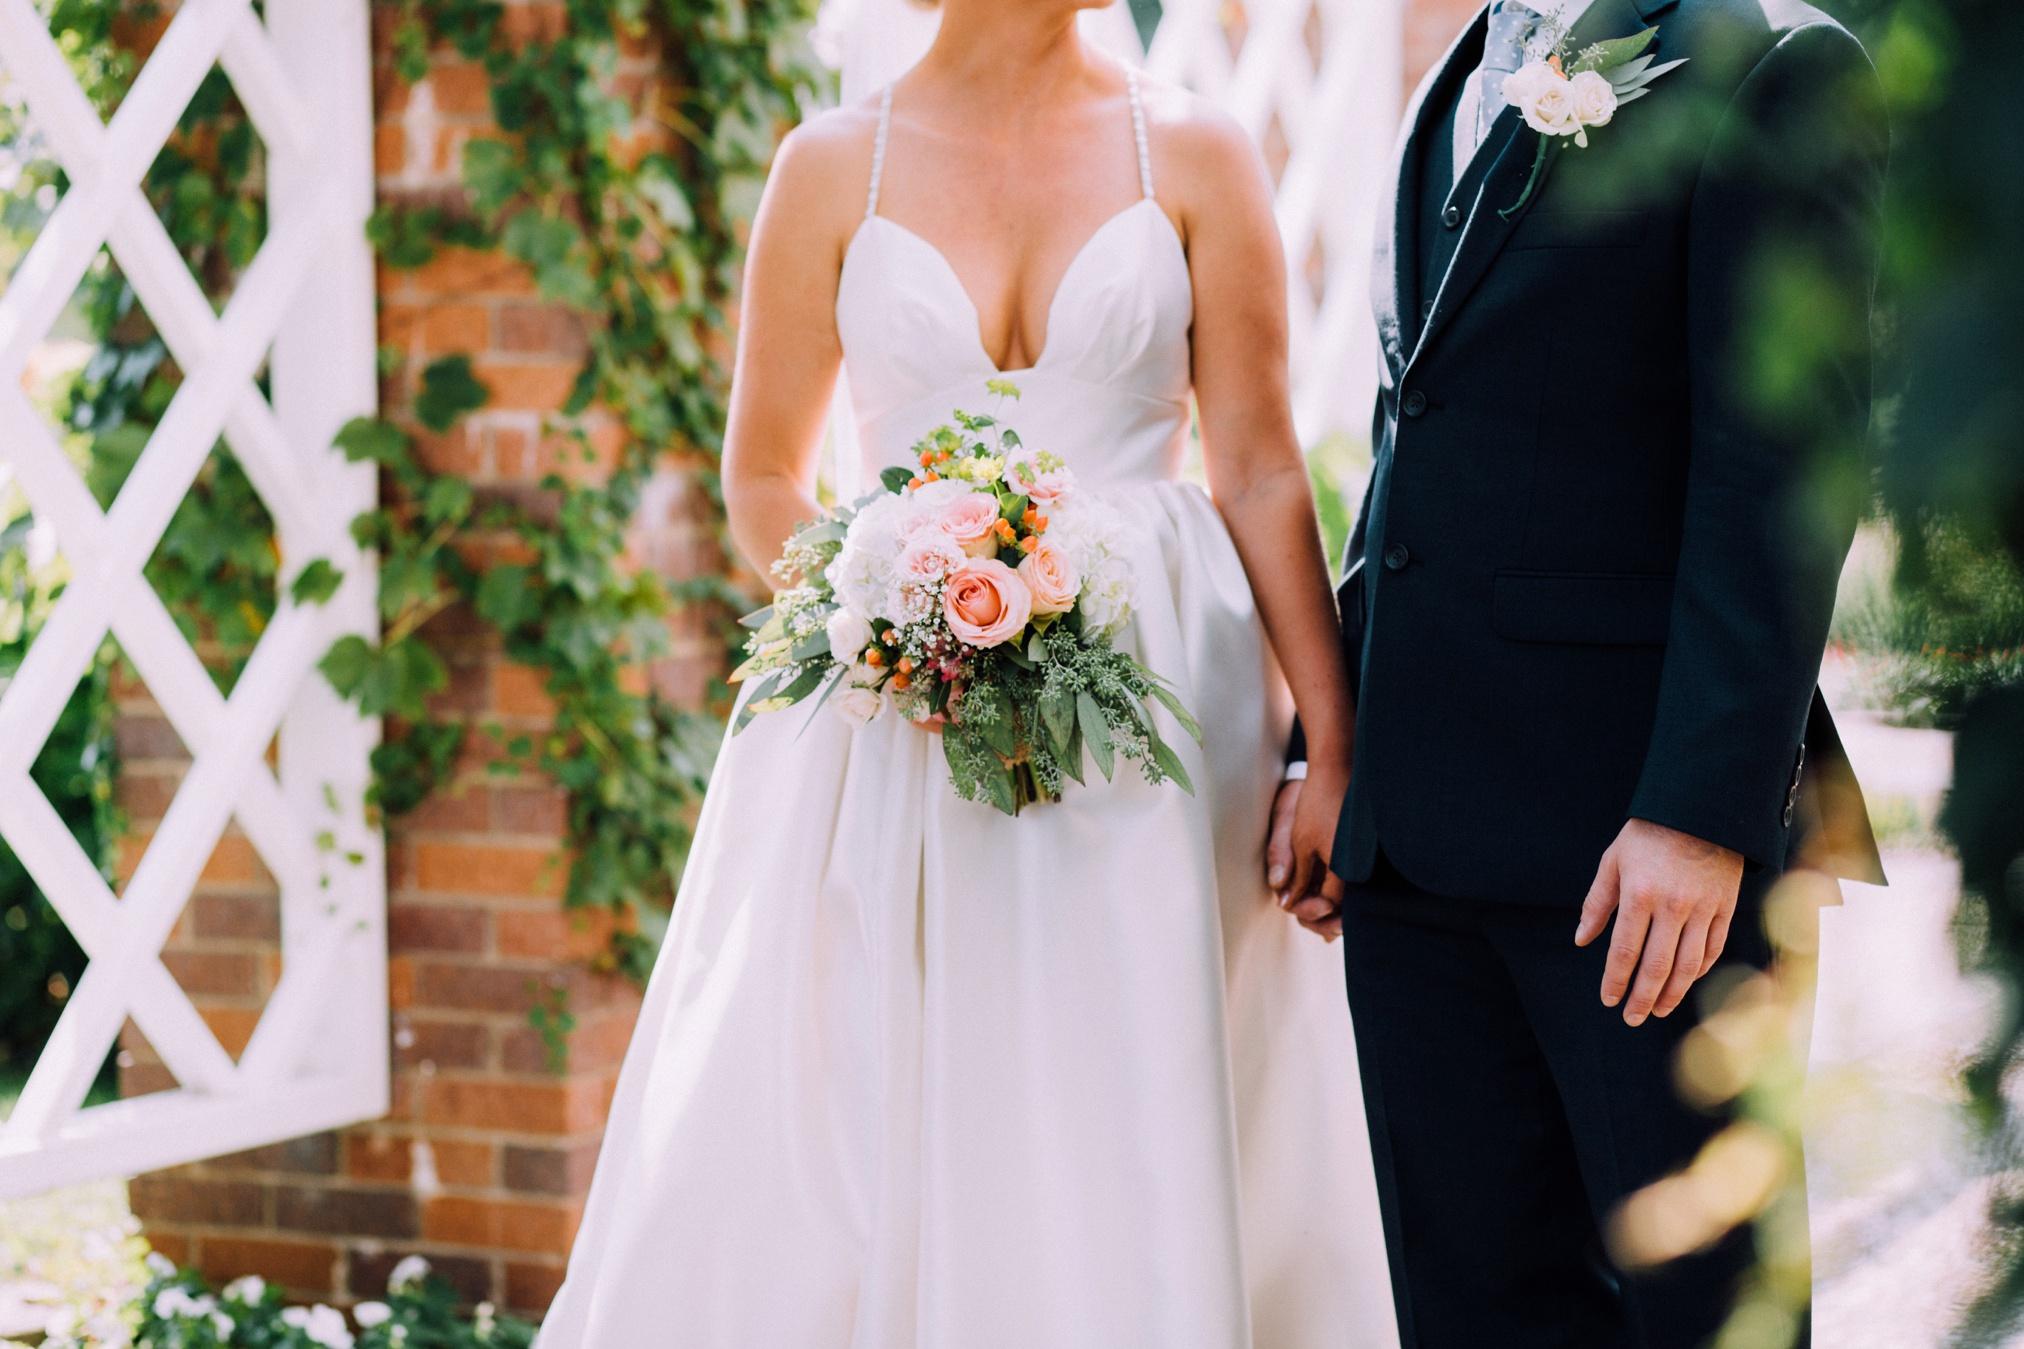 brenna+michael_wedding-261.jpg